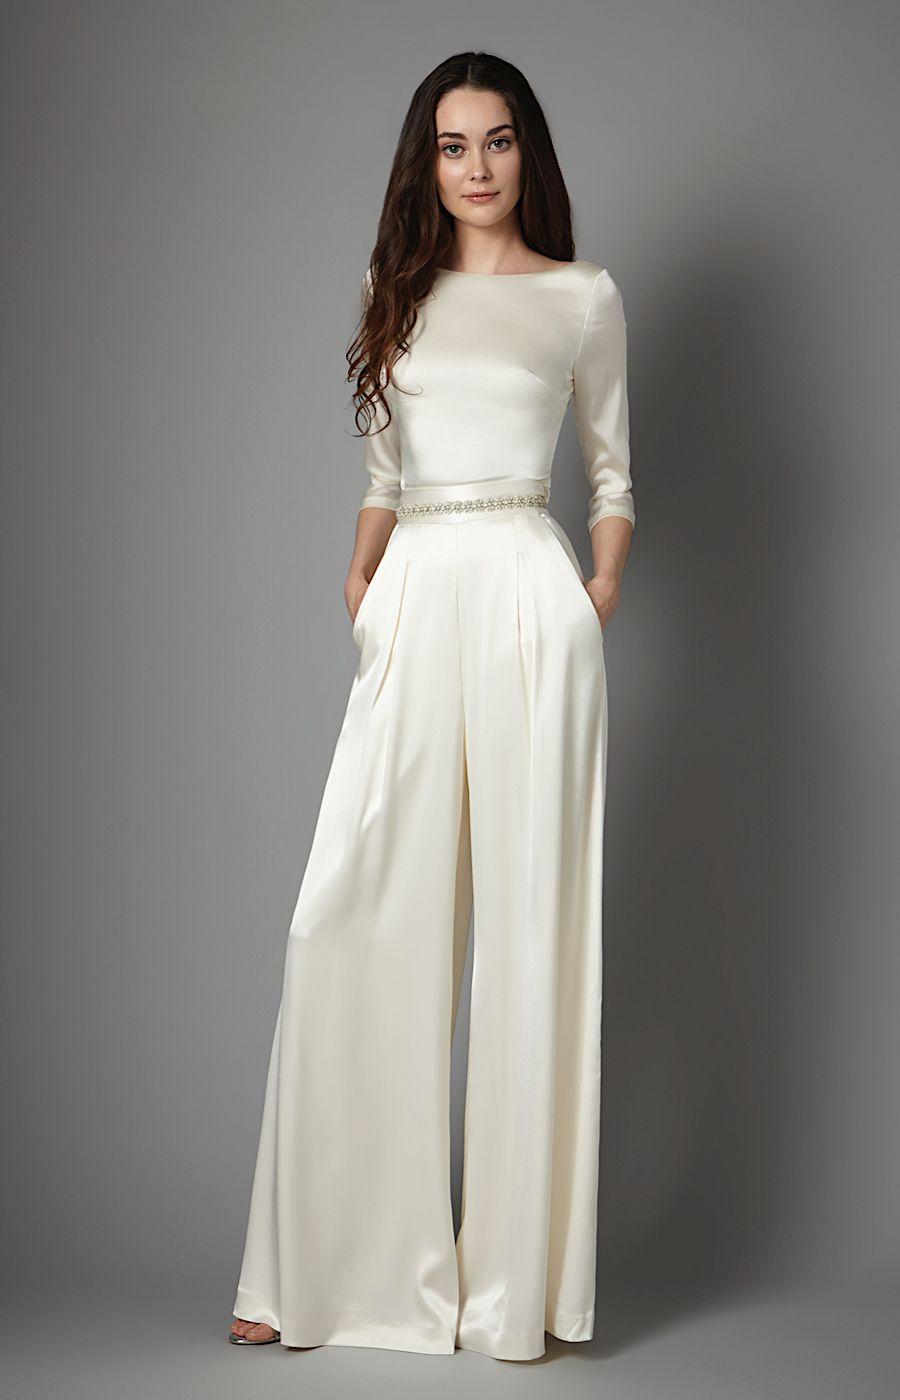 28 wedding dresses under £1,000 | Catherine deane wedding dress ...